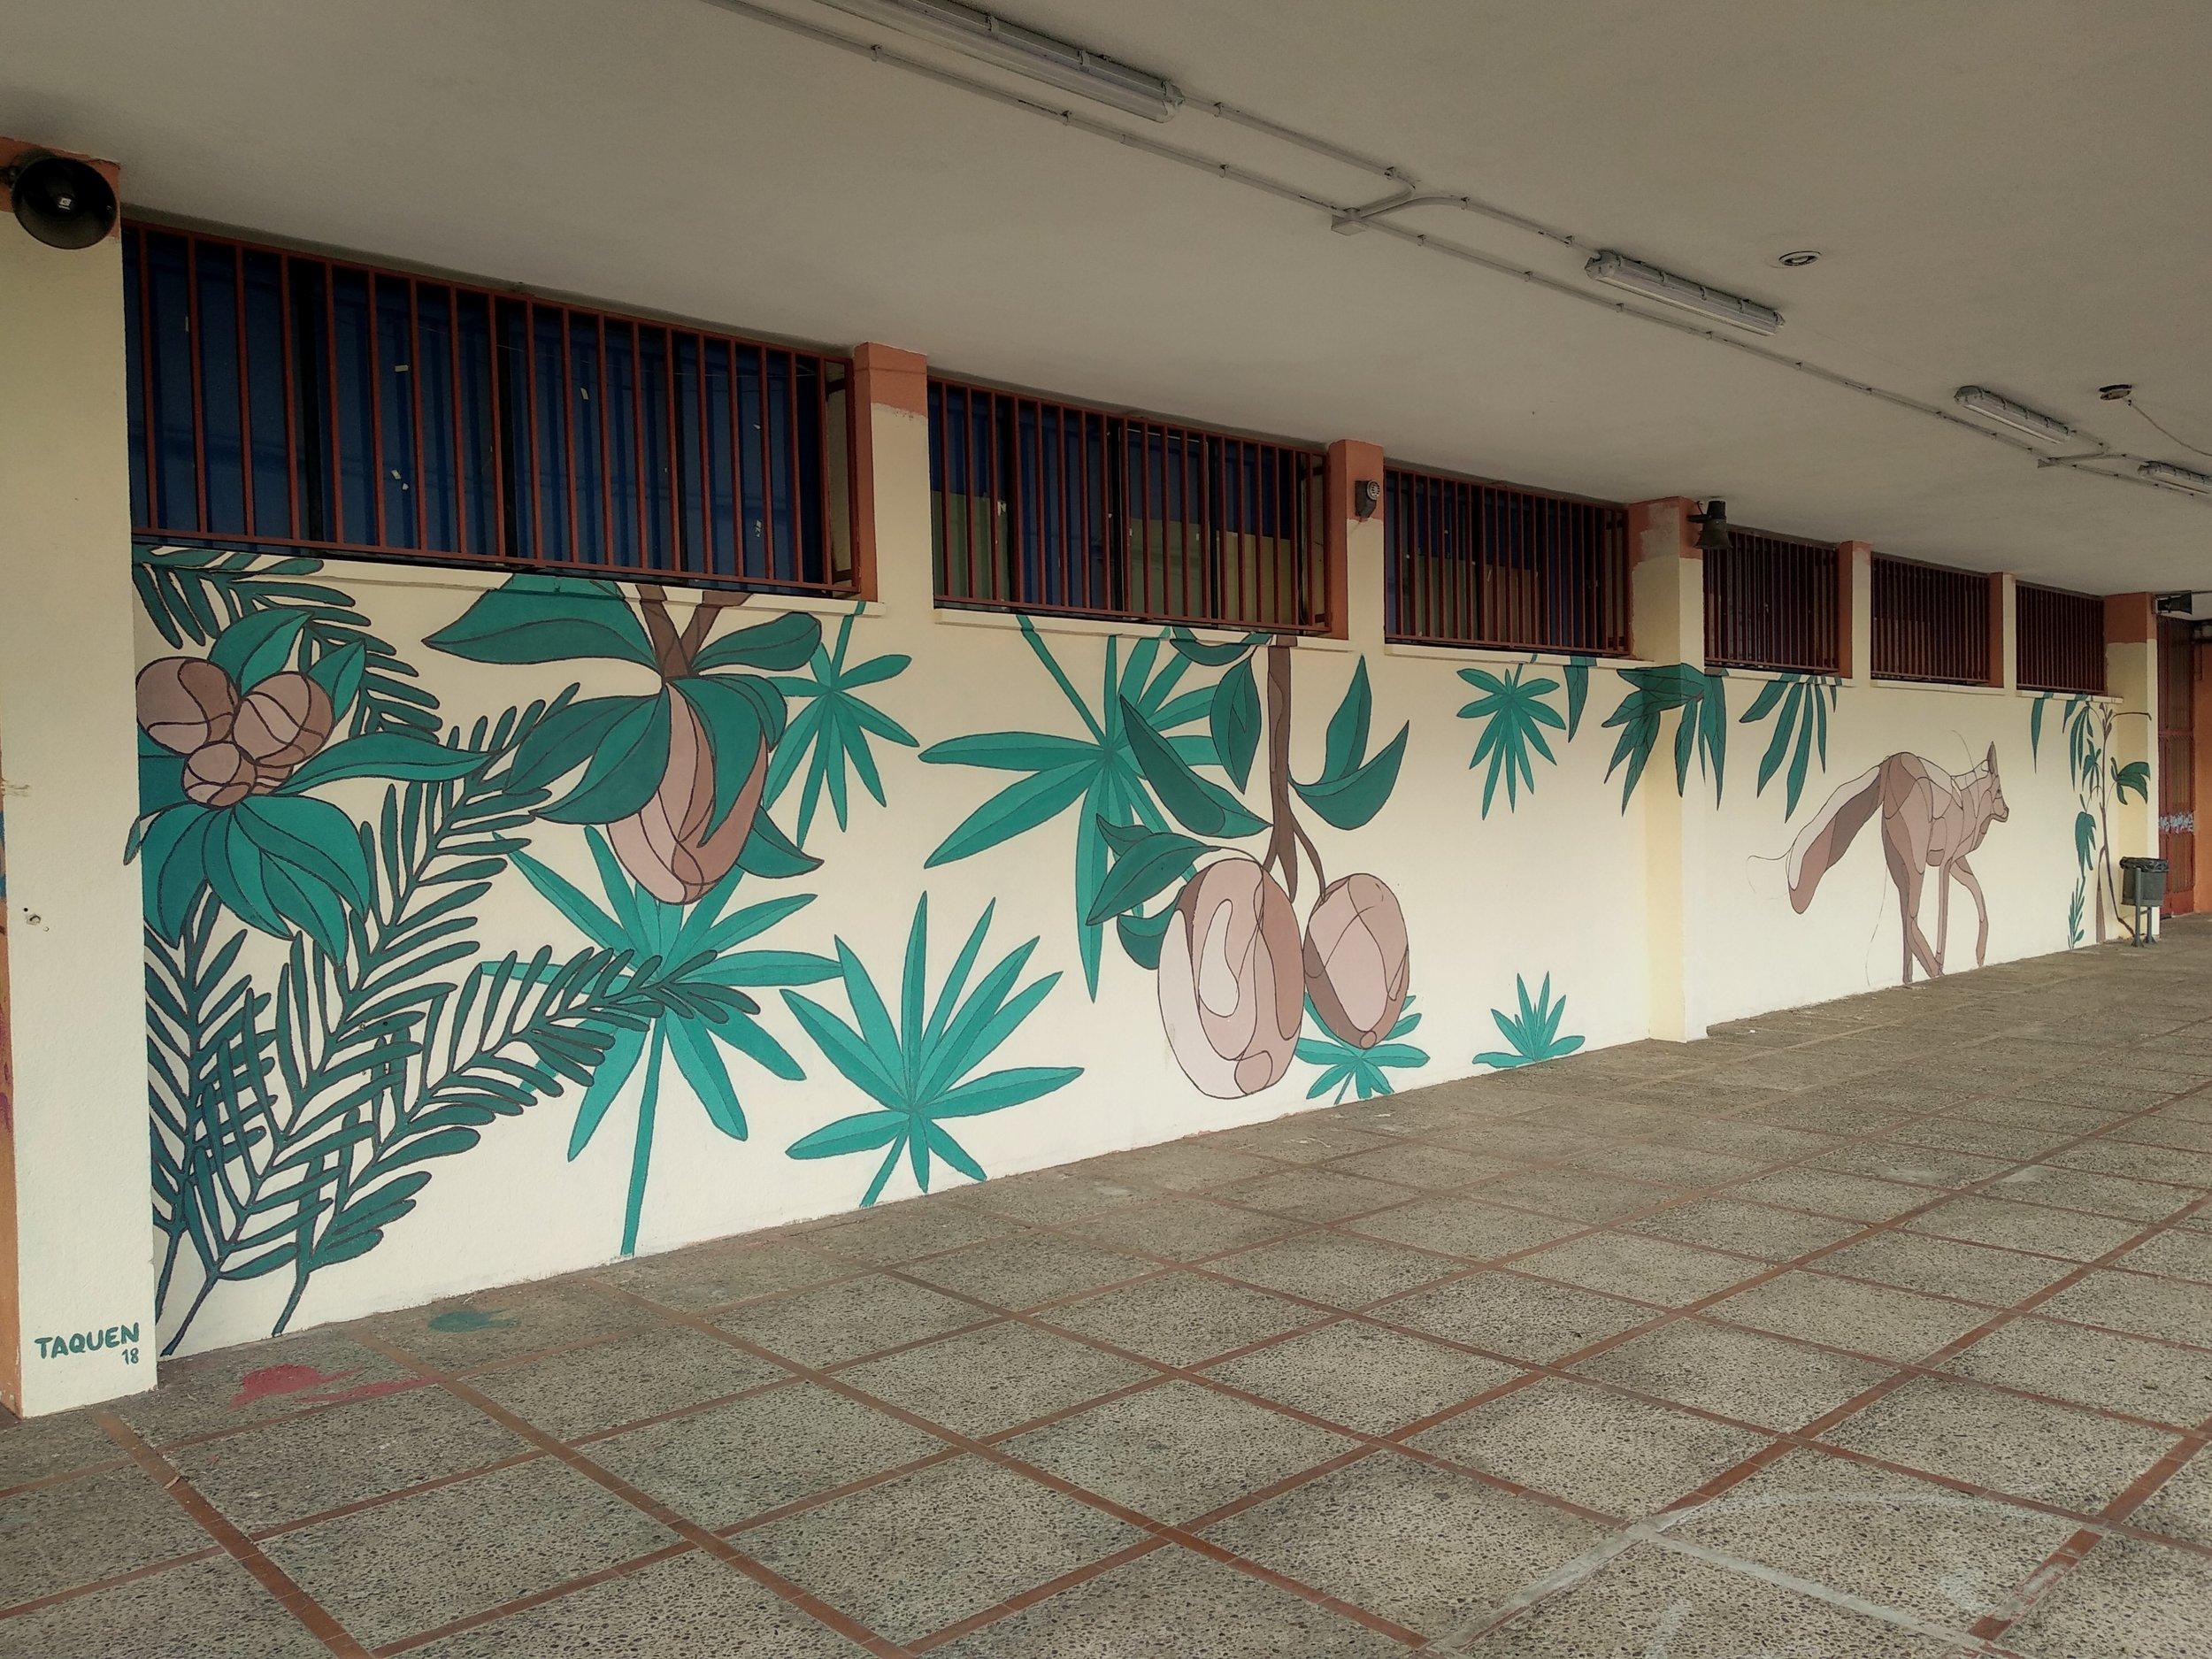 Centro Comunitario Guatemala, Madrid, Spain 2018